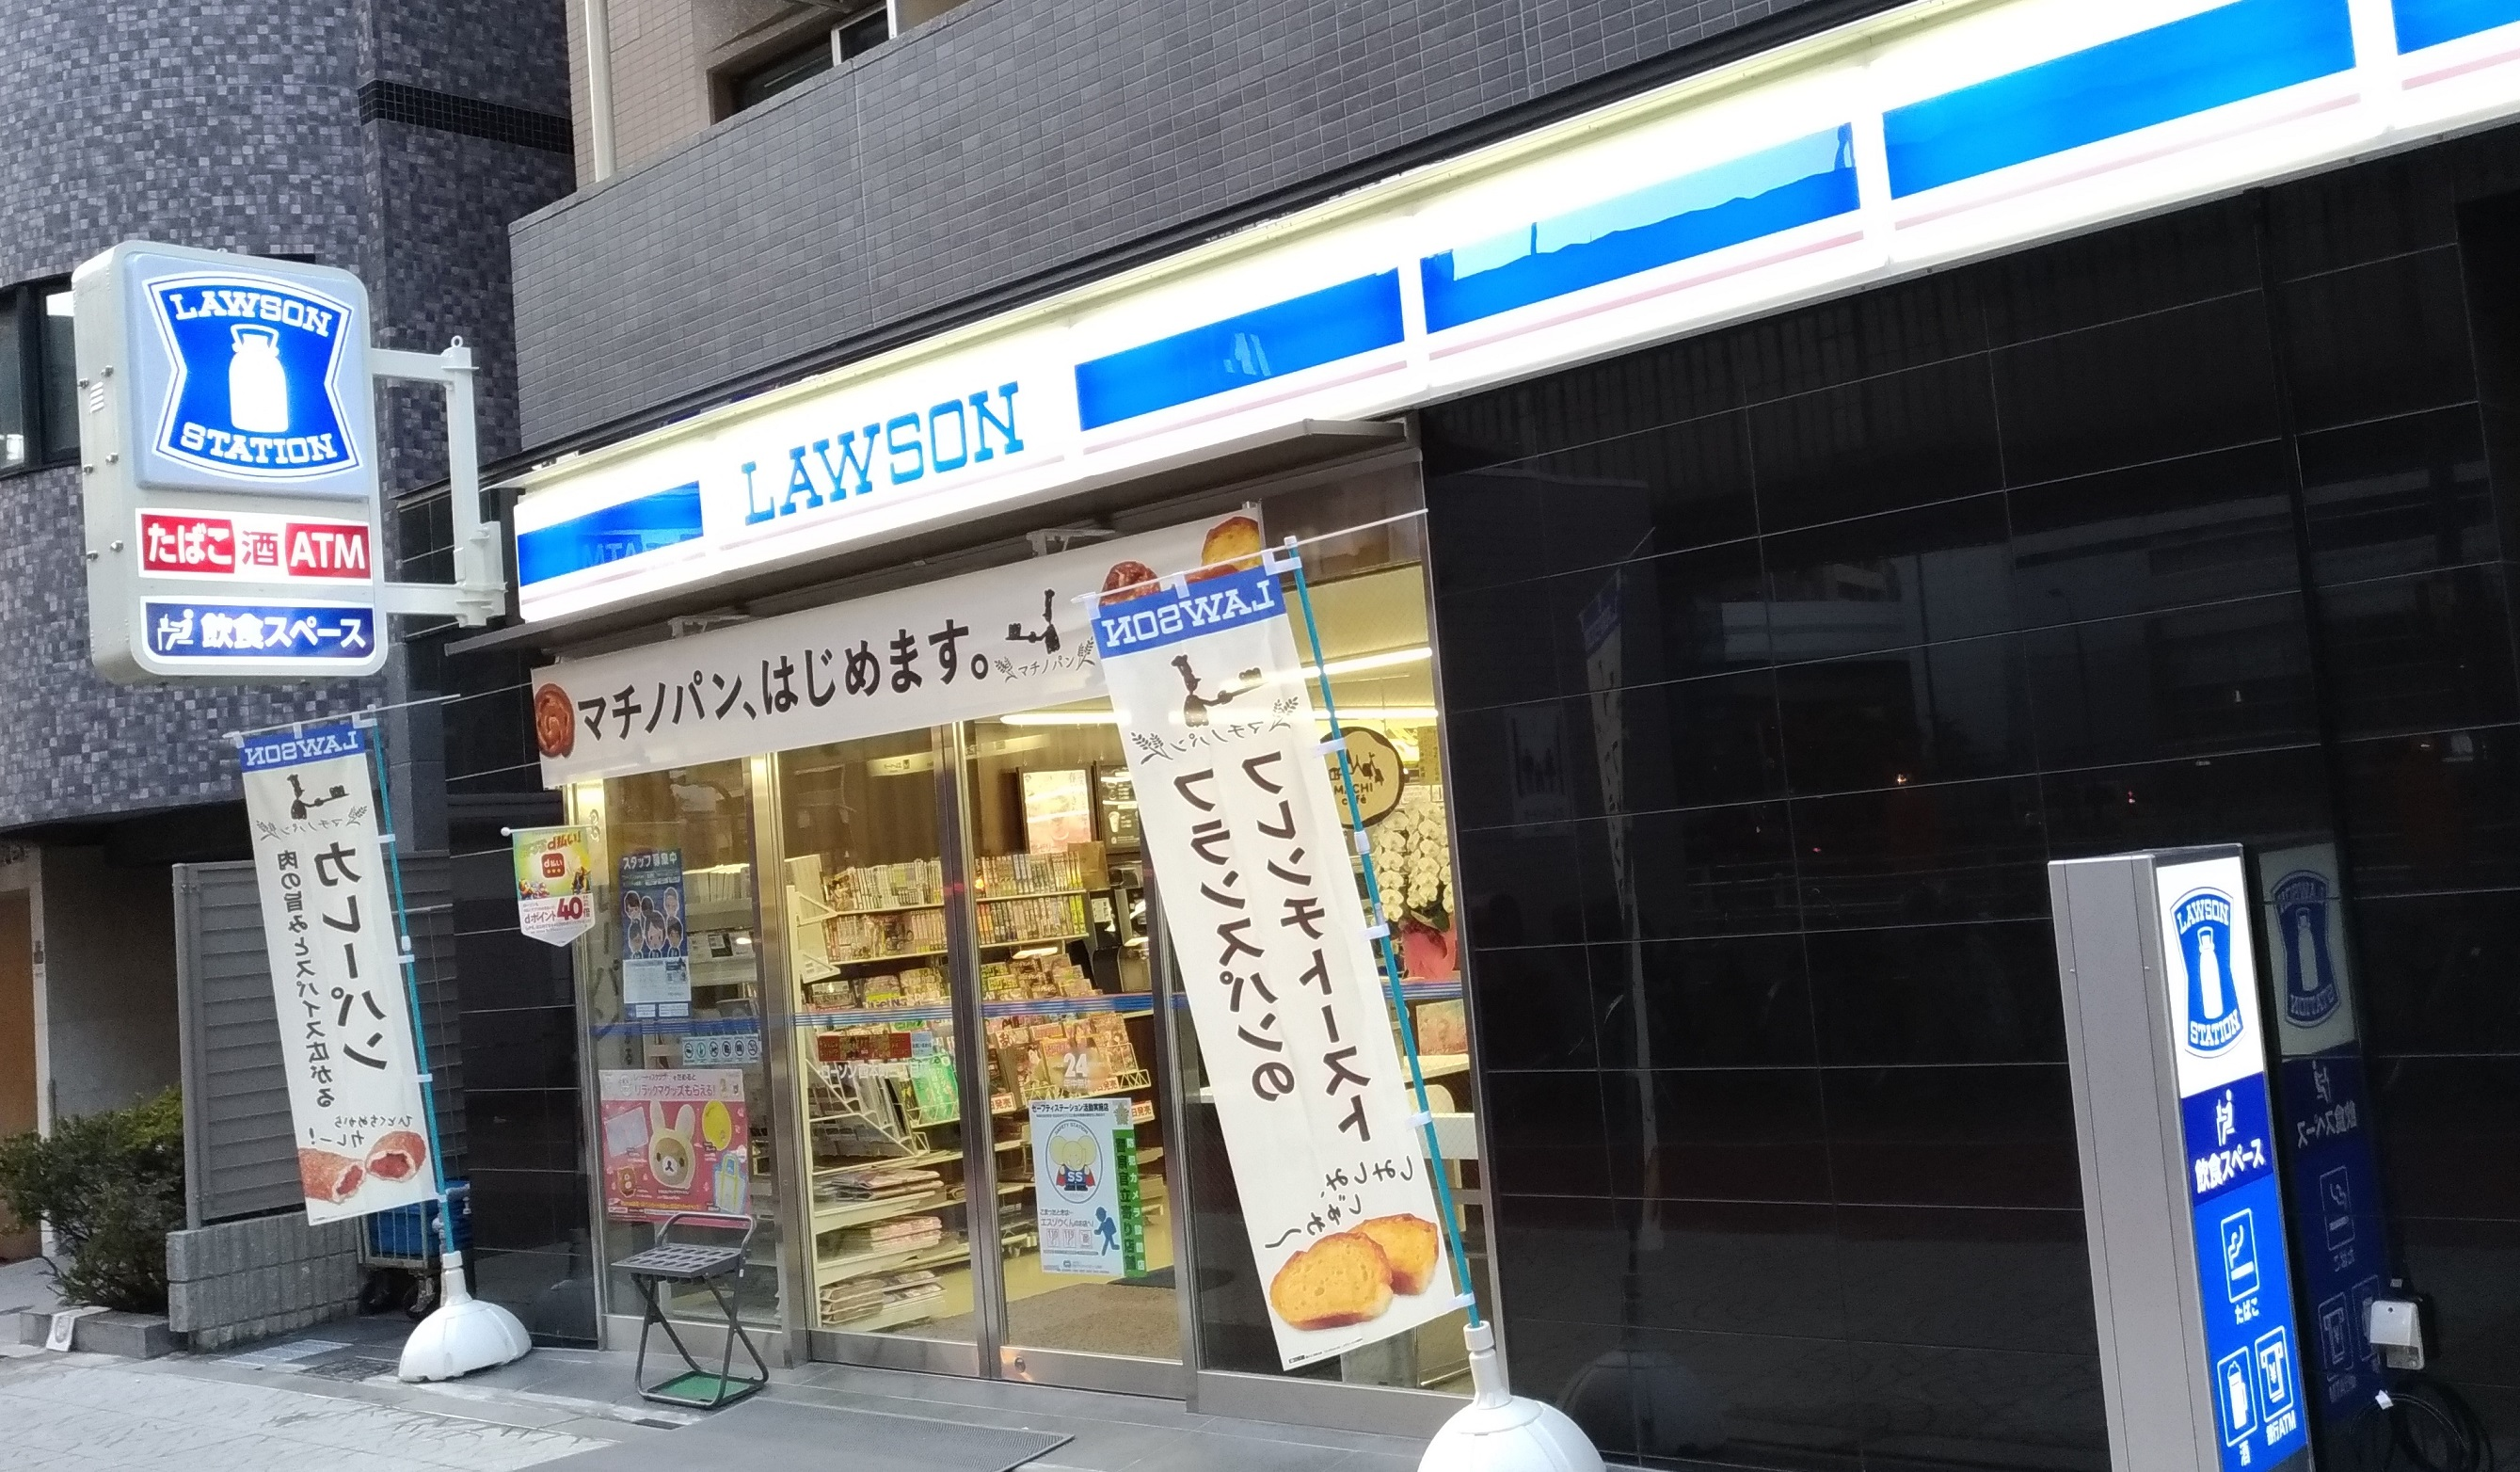 osaka_lawson_nishi_honmachi_convini.jpg